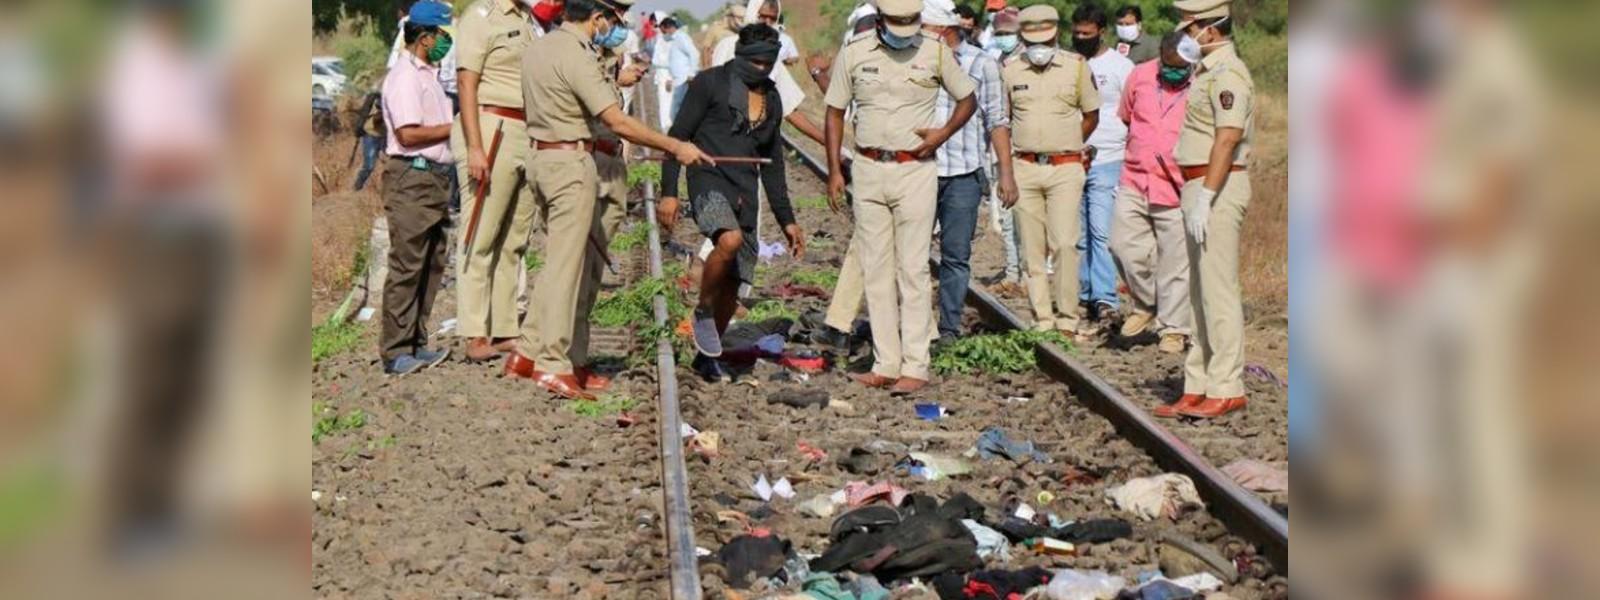 Indian train kills 14 workers laid-off in coronavirus lockdown